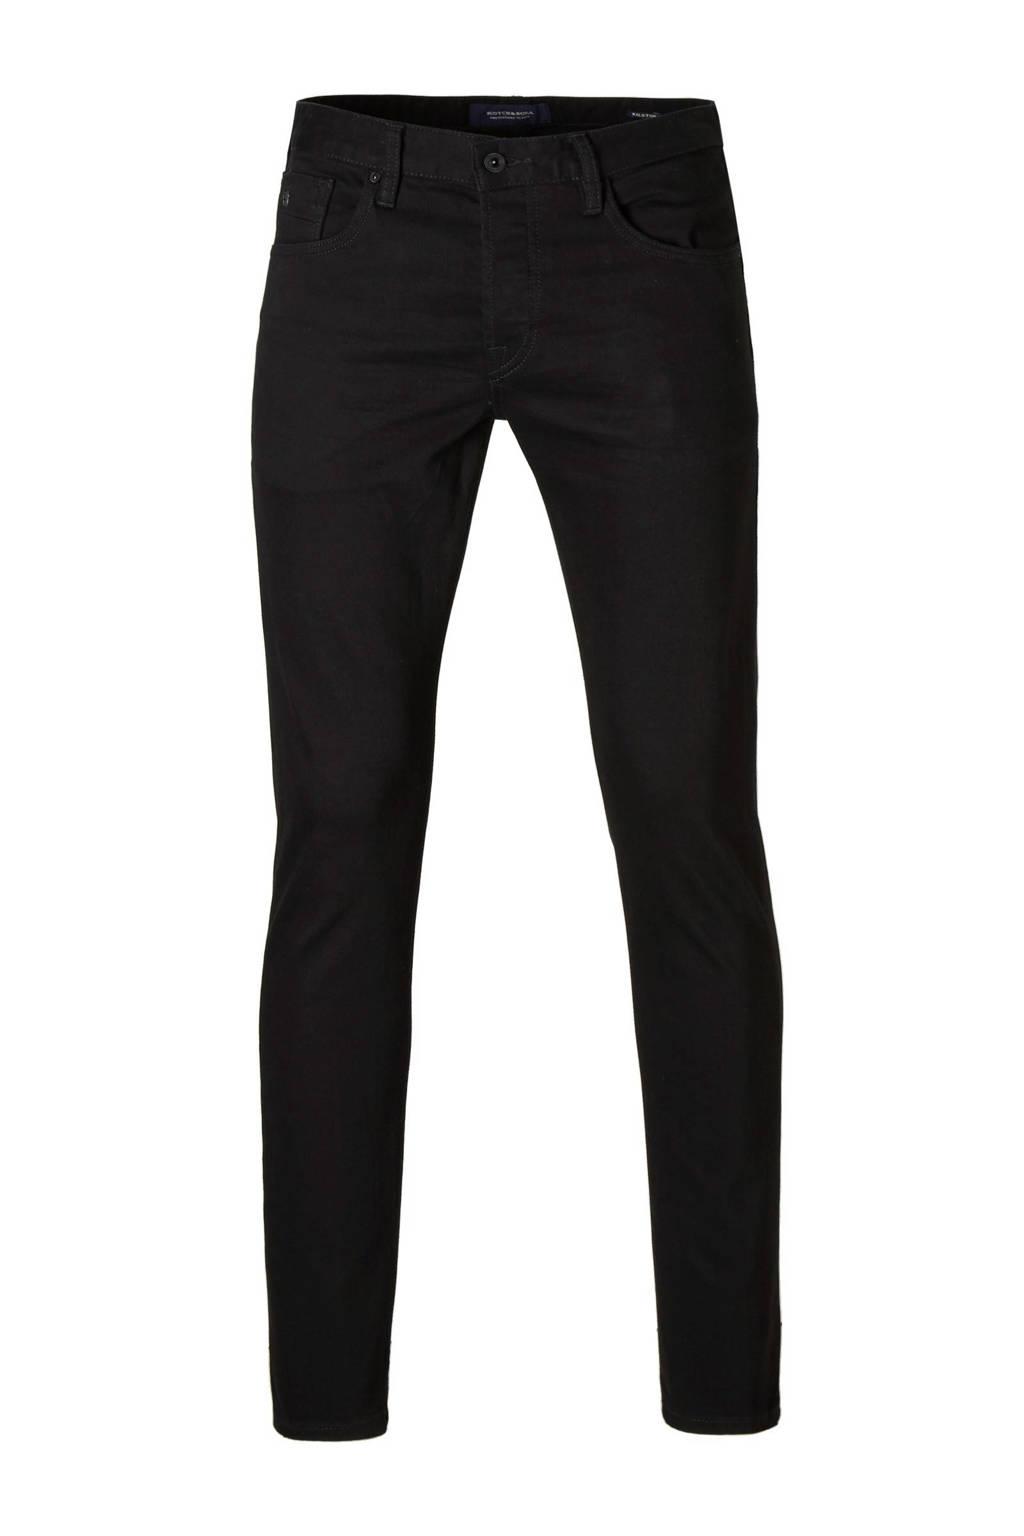 Scotch & Soda regular fit jeans Ralston, Stay Black